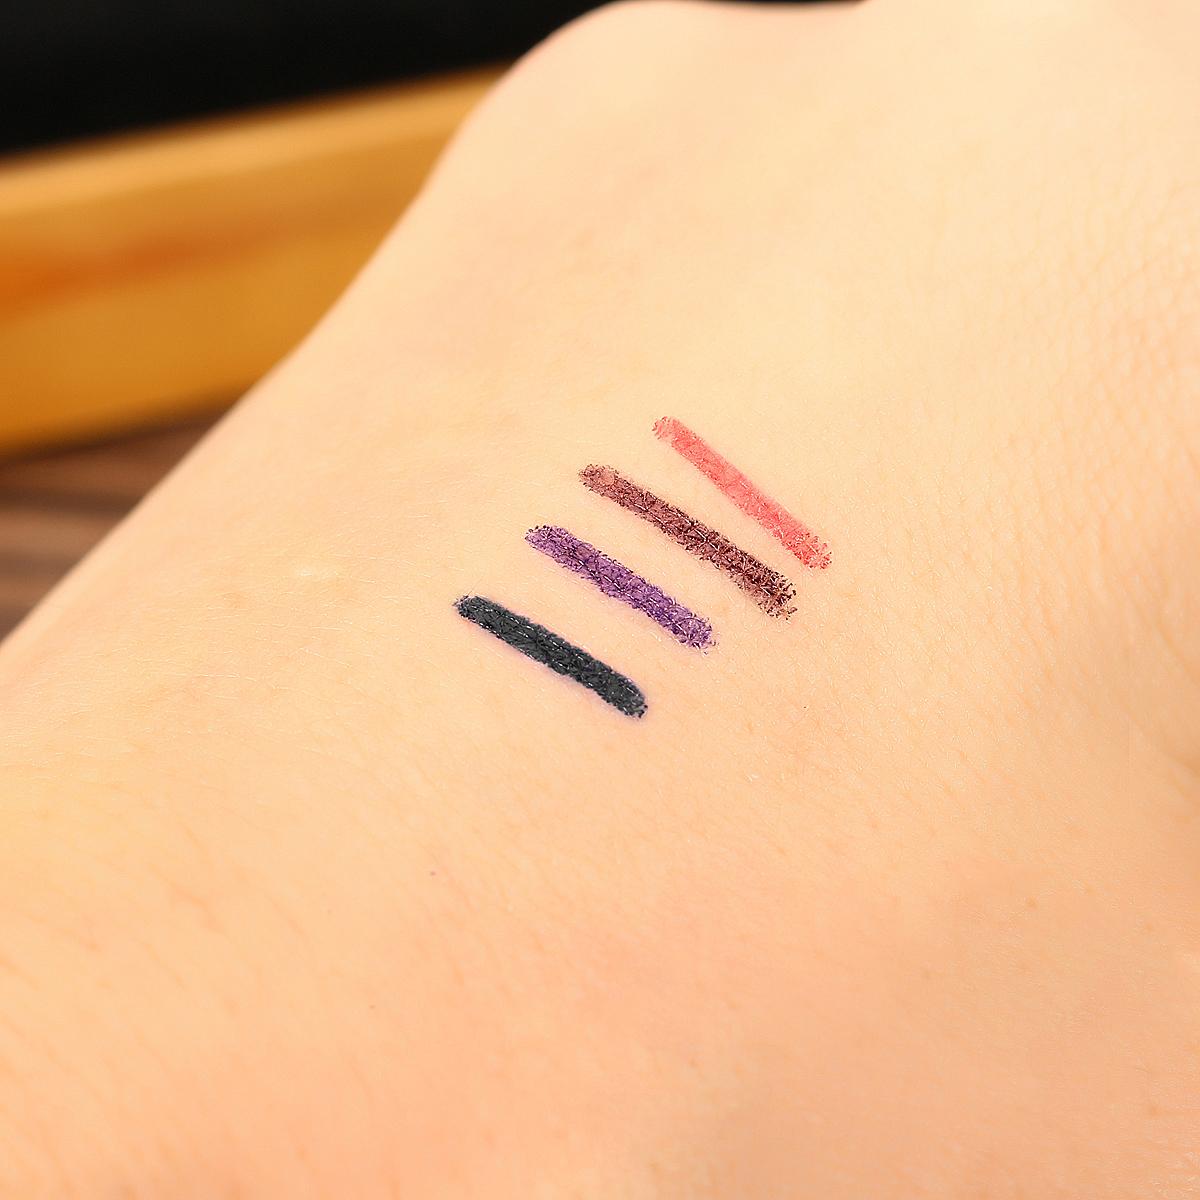 Transfer Printing Ink Cartridge Manual Tattoo Mark Pen Holder